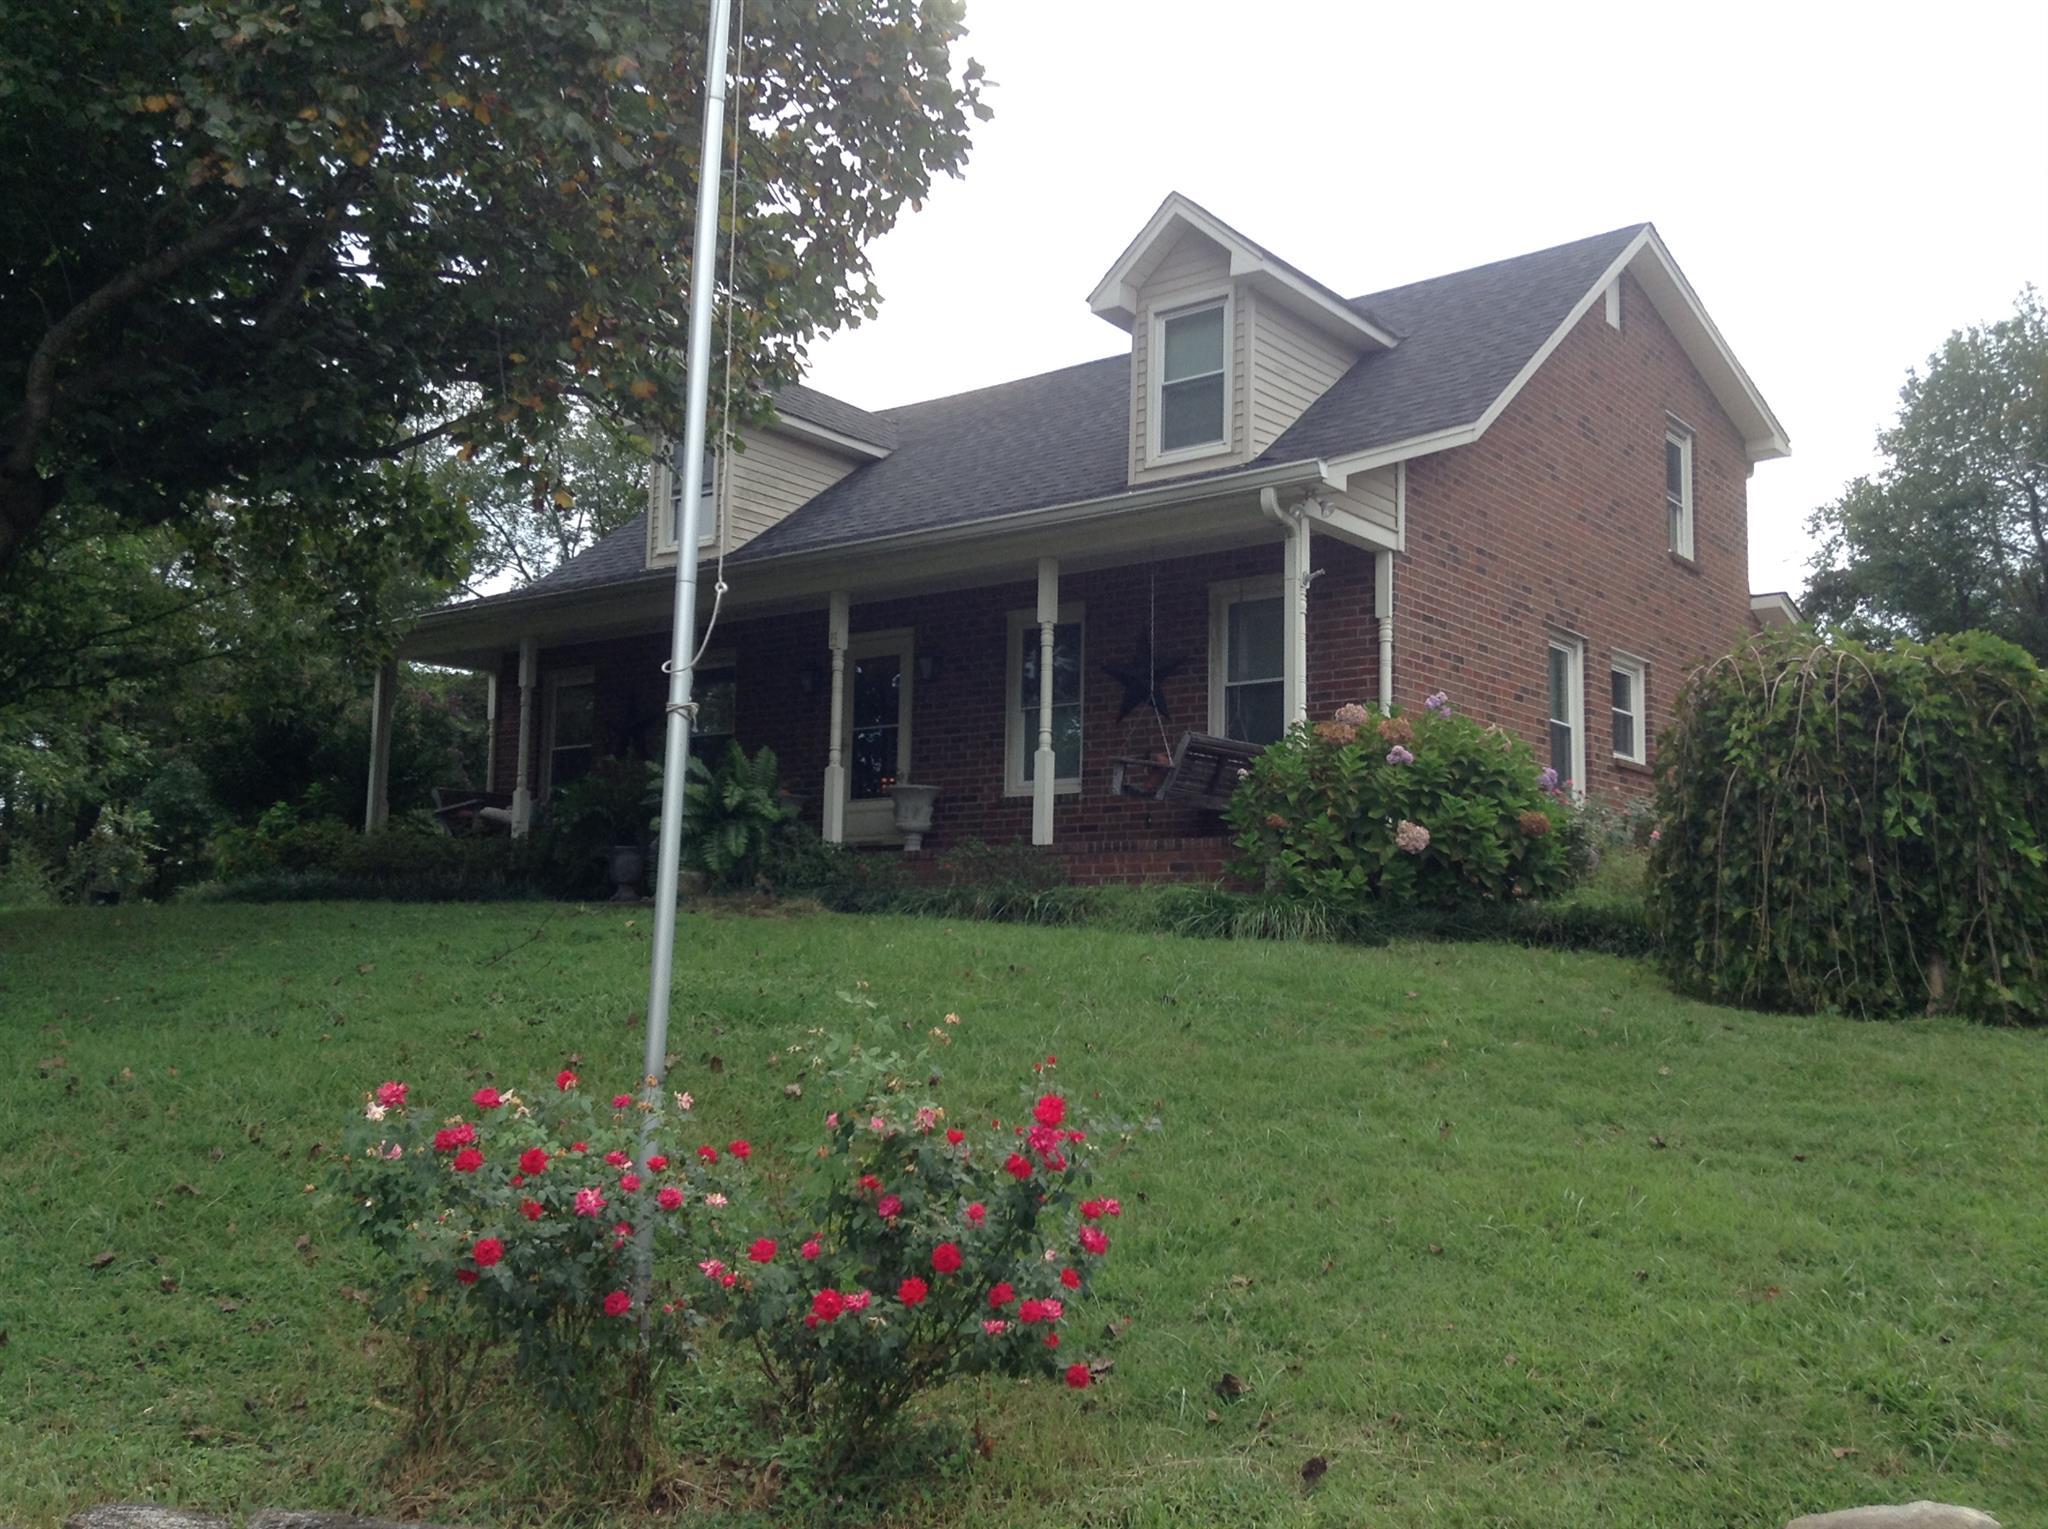 6844 Choctaw Rd, College Grove, TN 37046